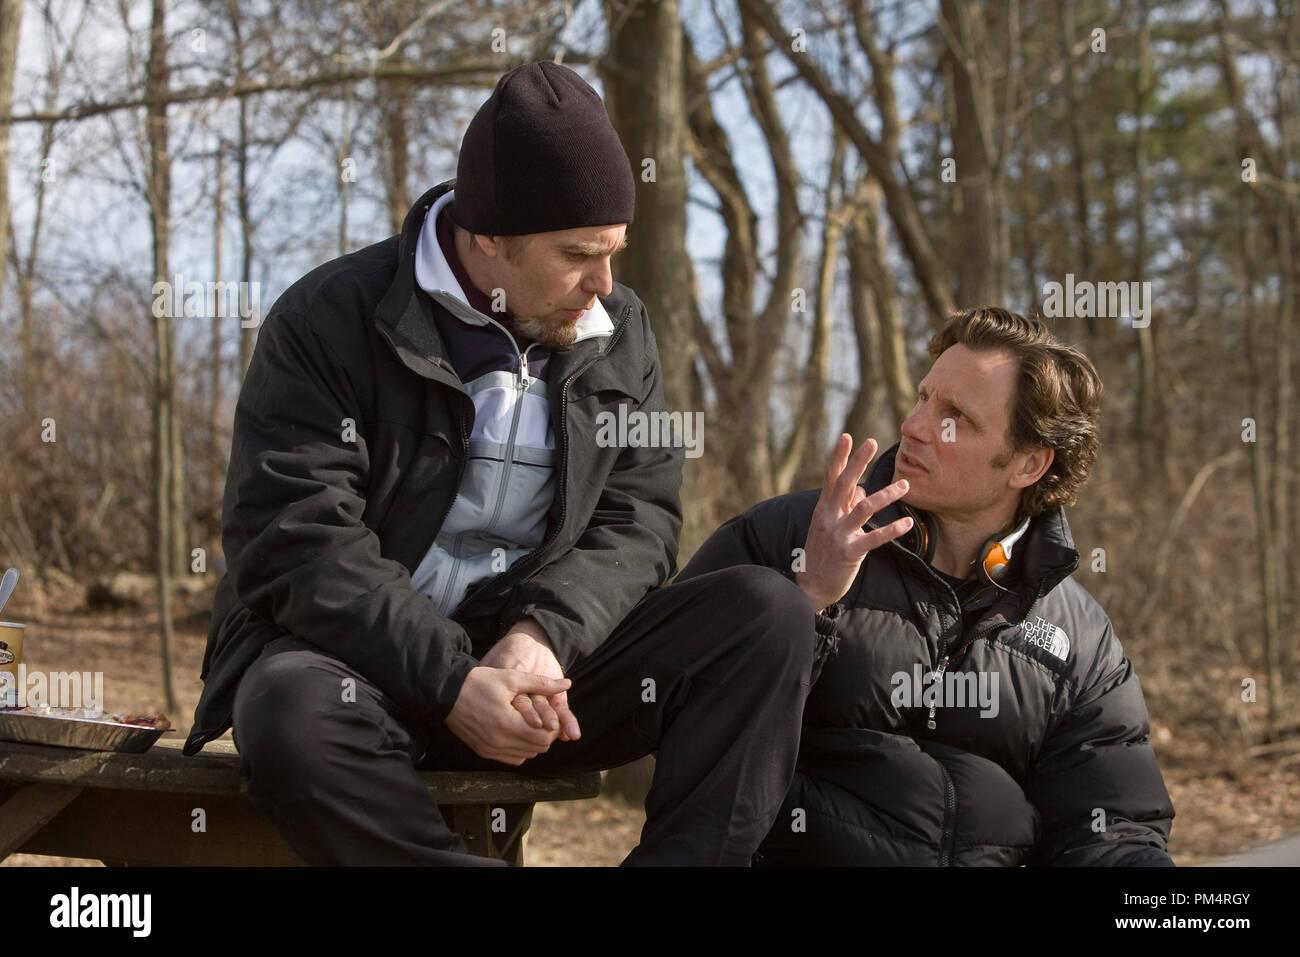 L-R: Sam Rockwell and Director Tony Goldwyn on the set; Photo by Ron Batzdorff 2010 - Stock Image